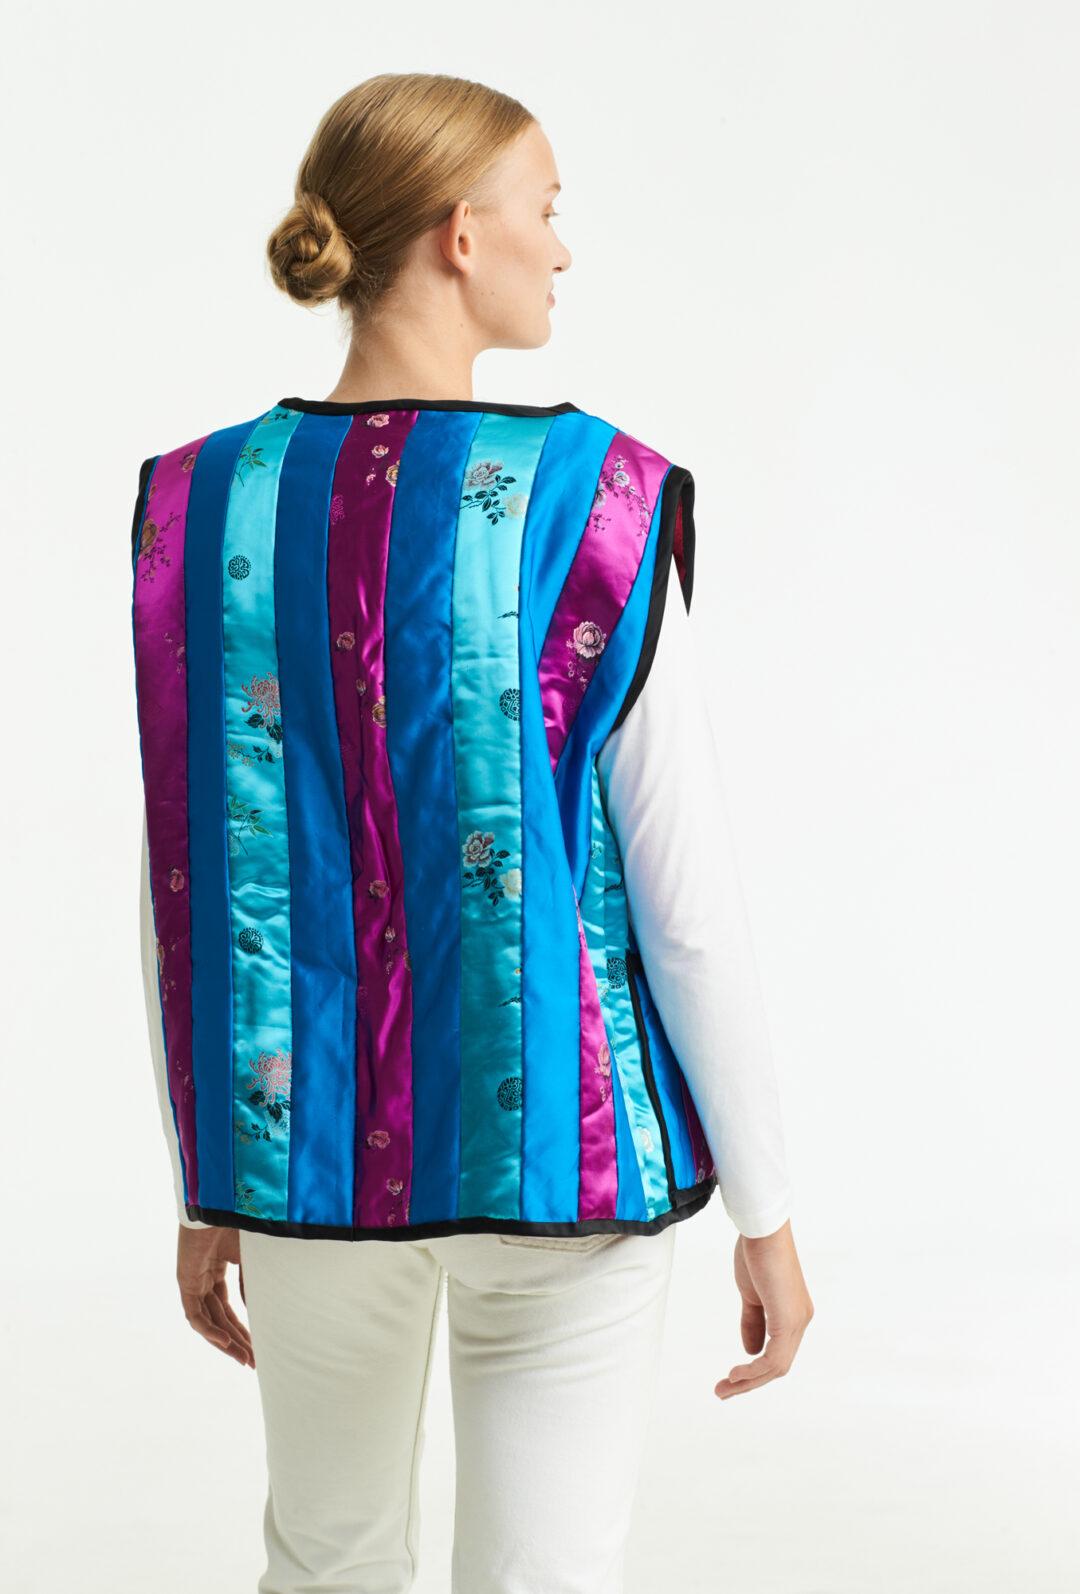 Collect23 vintage vest